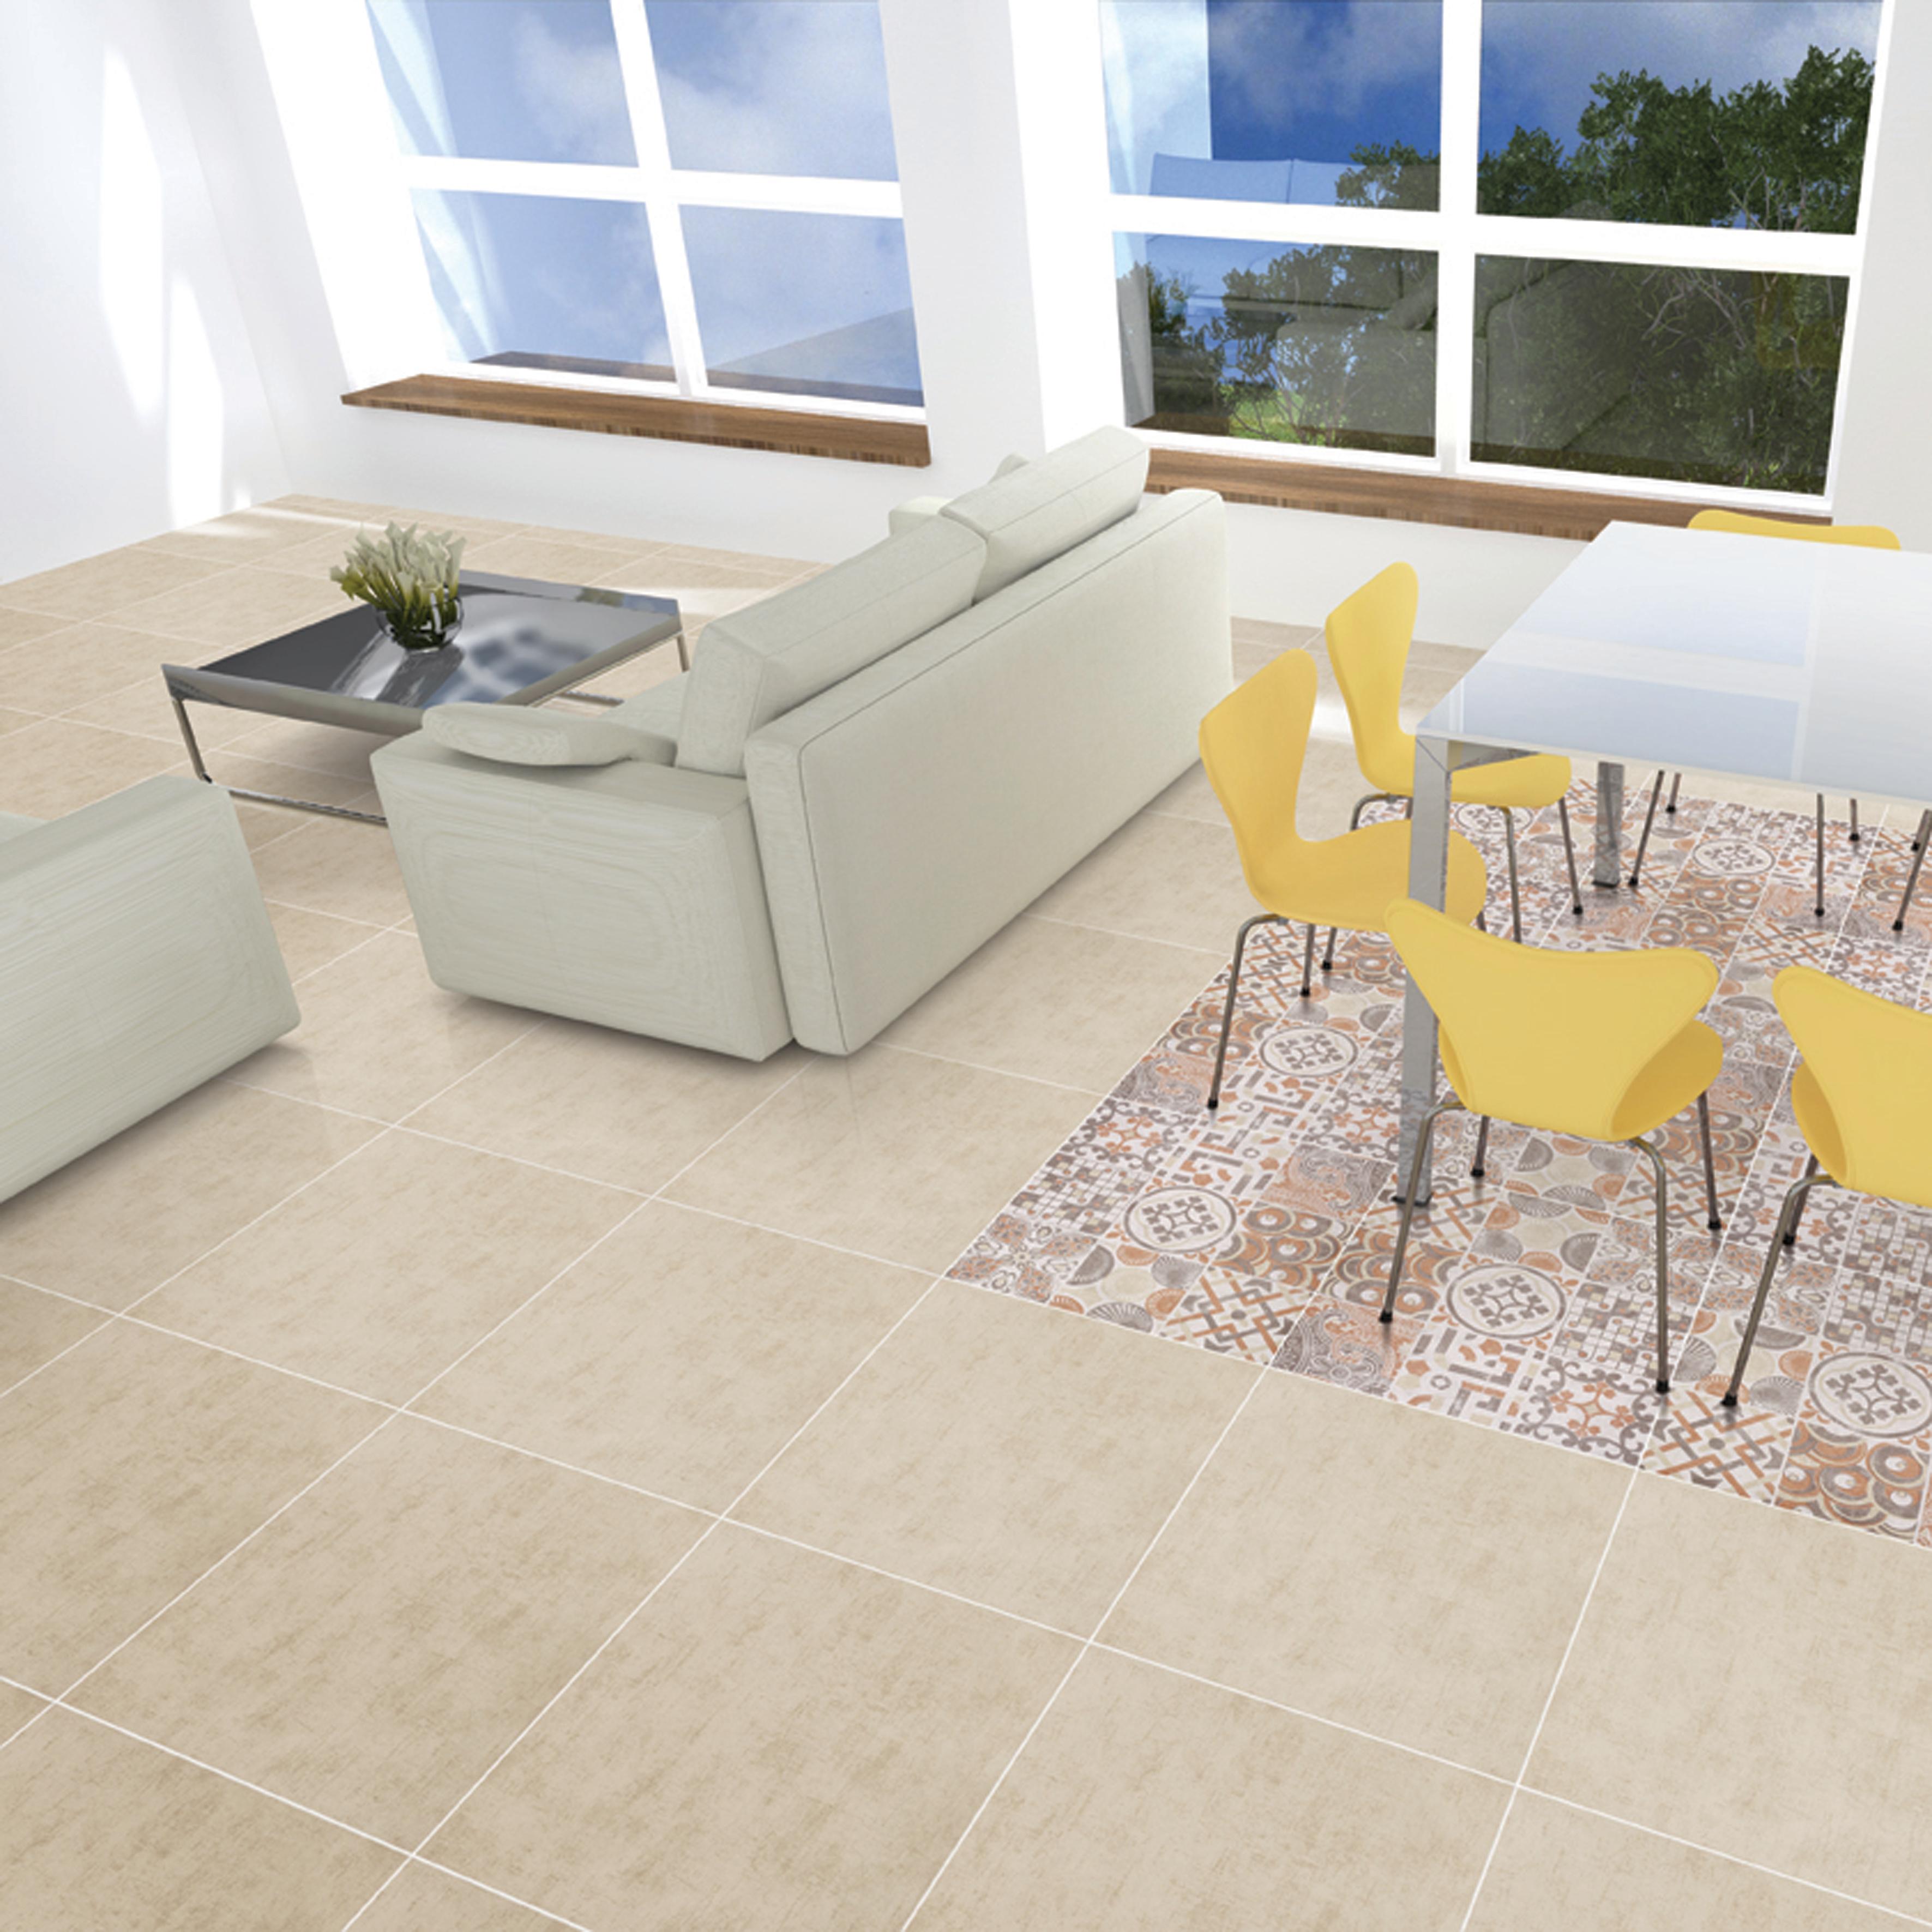 Concrete a 300x300 Image 1